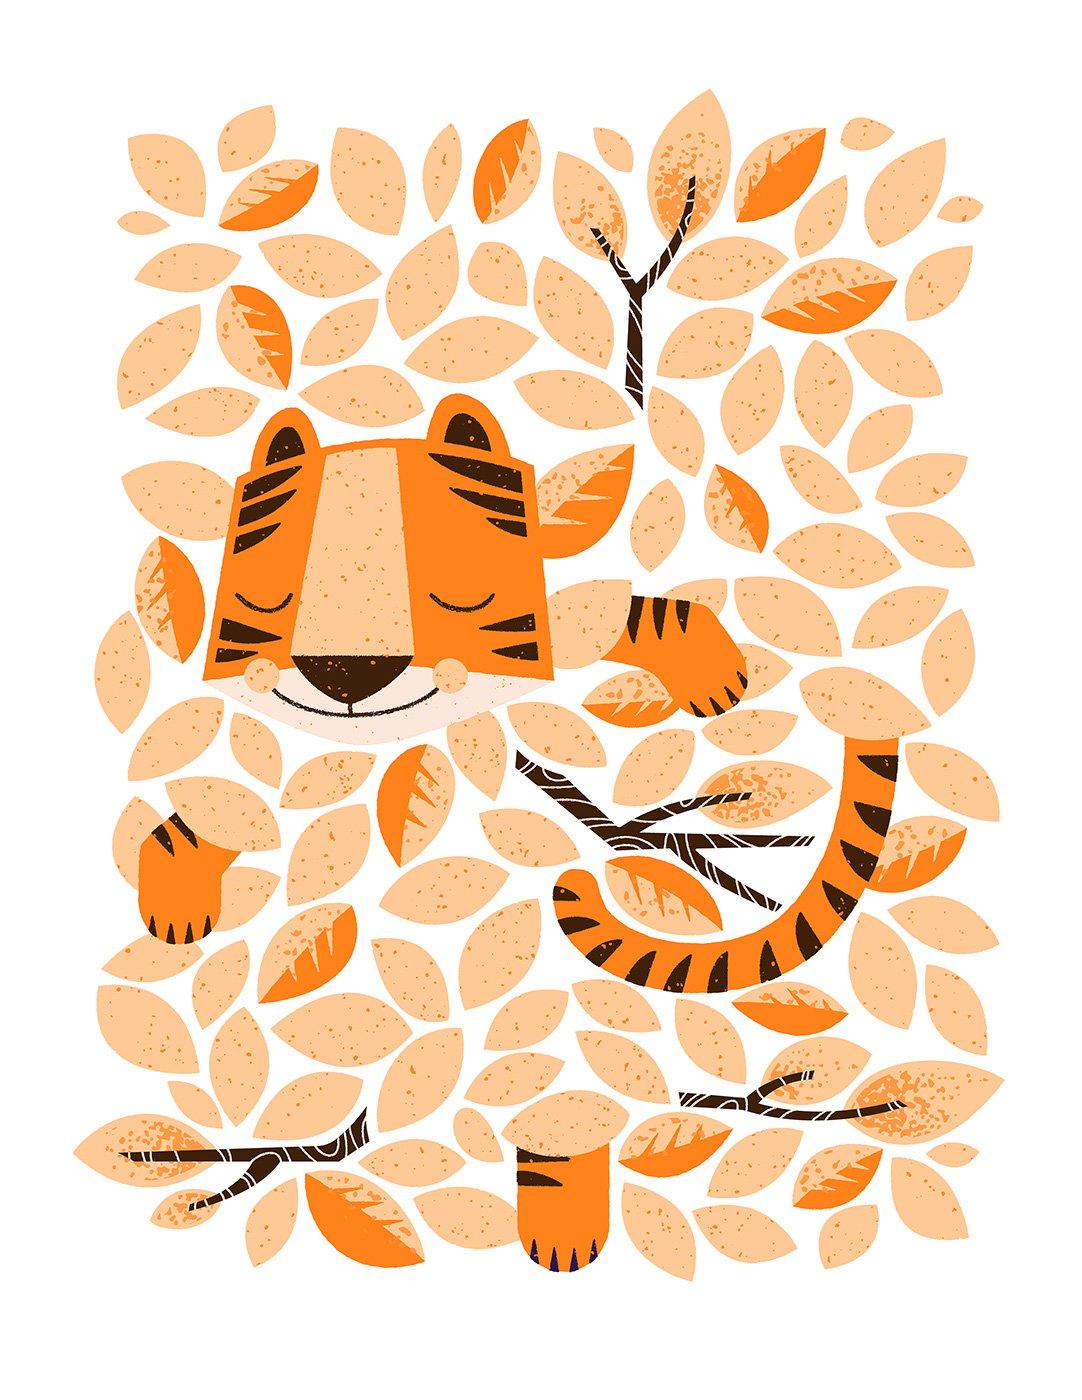 Image of Dors bien petit tigre | Sleep Tight Tiger